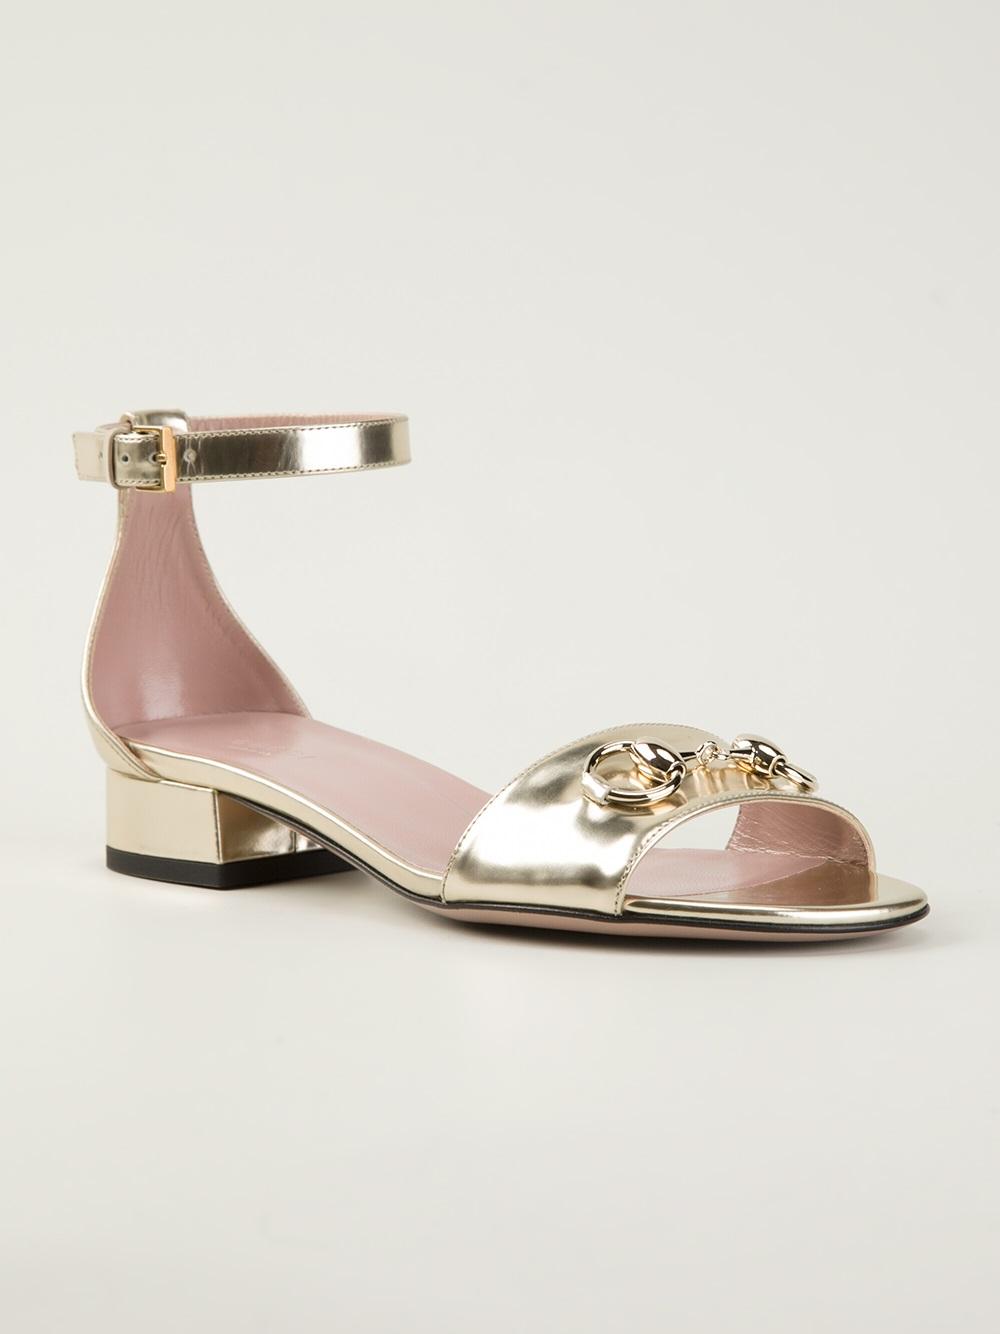 86bf78f91a0 Lyst - Gucci Horsebit Sandals in Metallic